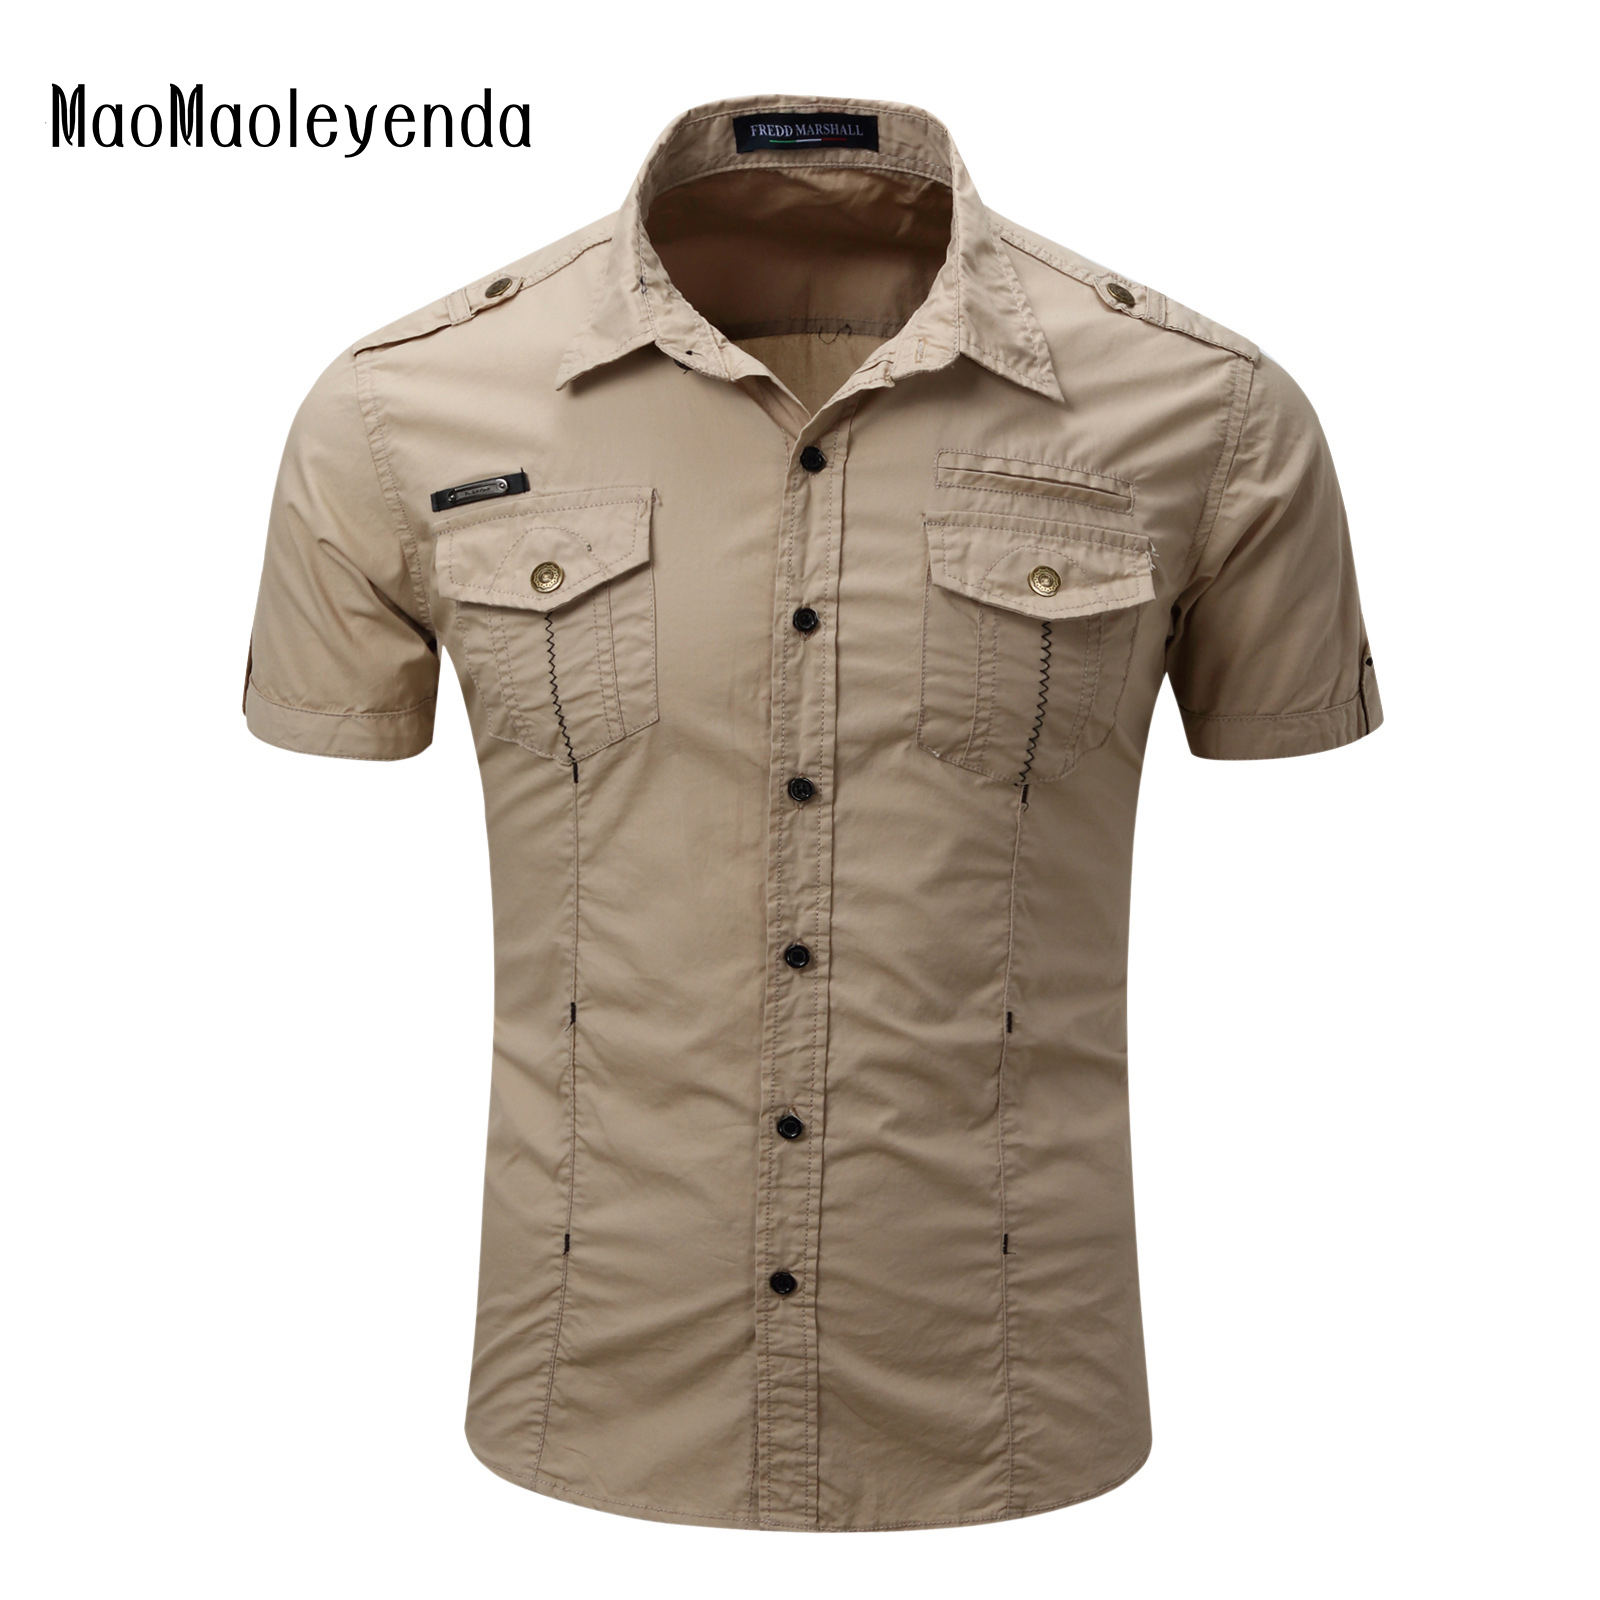 Shirt design china - 2017 New Men S Casual Epaulet Shirt Short Sleeves Mens Ruffled Cotton Shirts Fashion Pocket Decoration Male